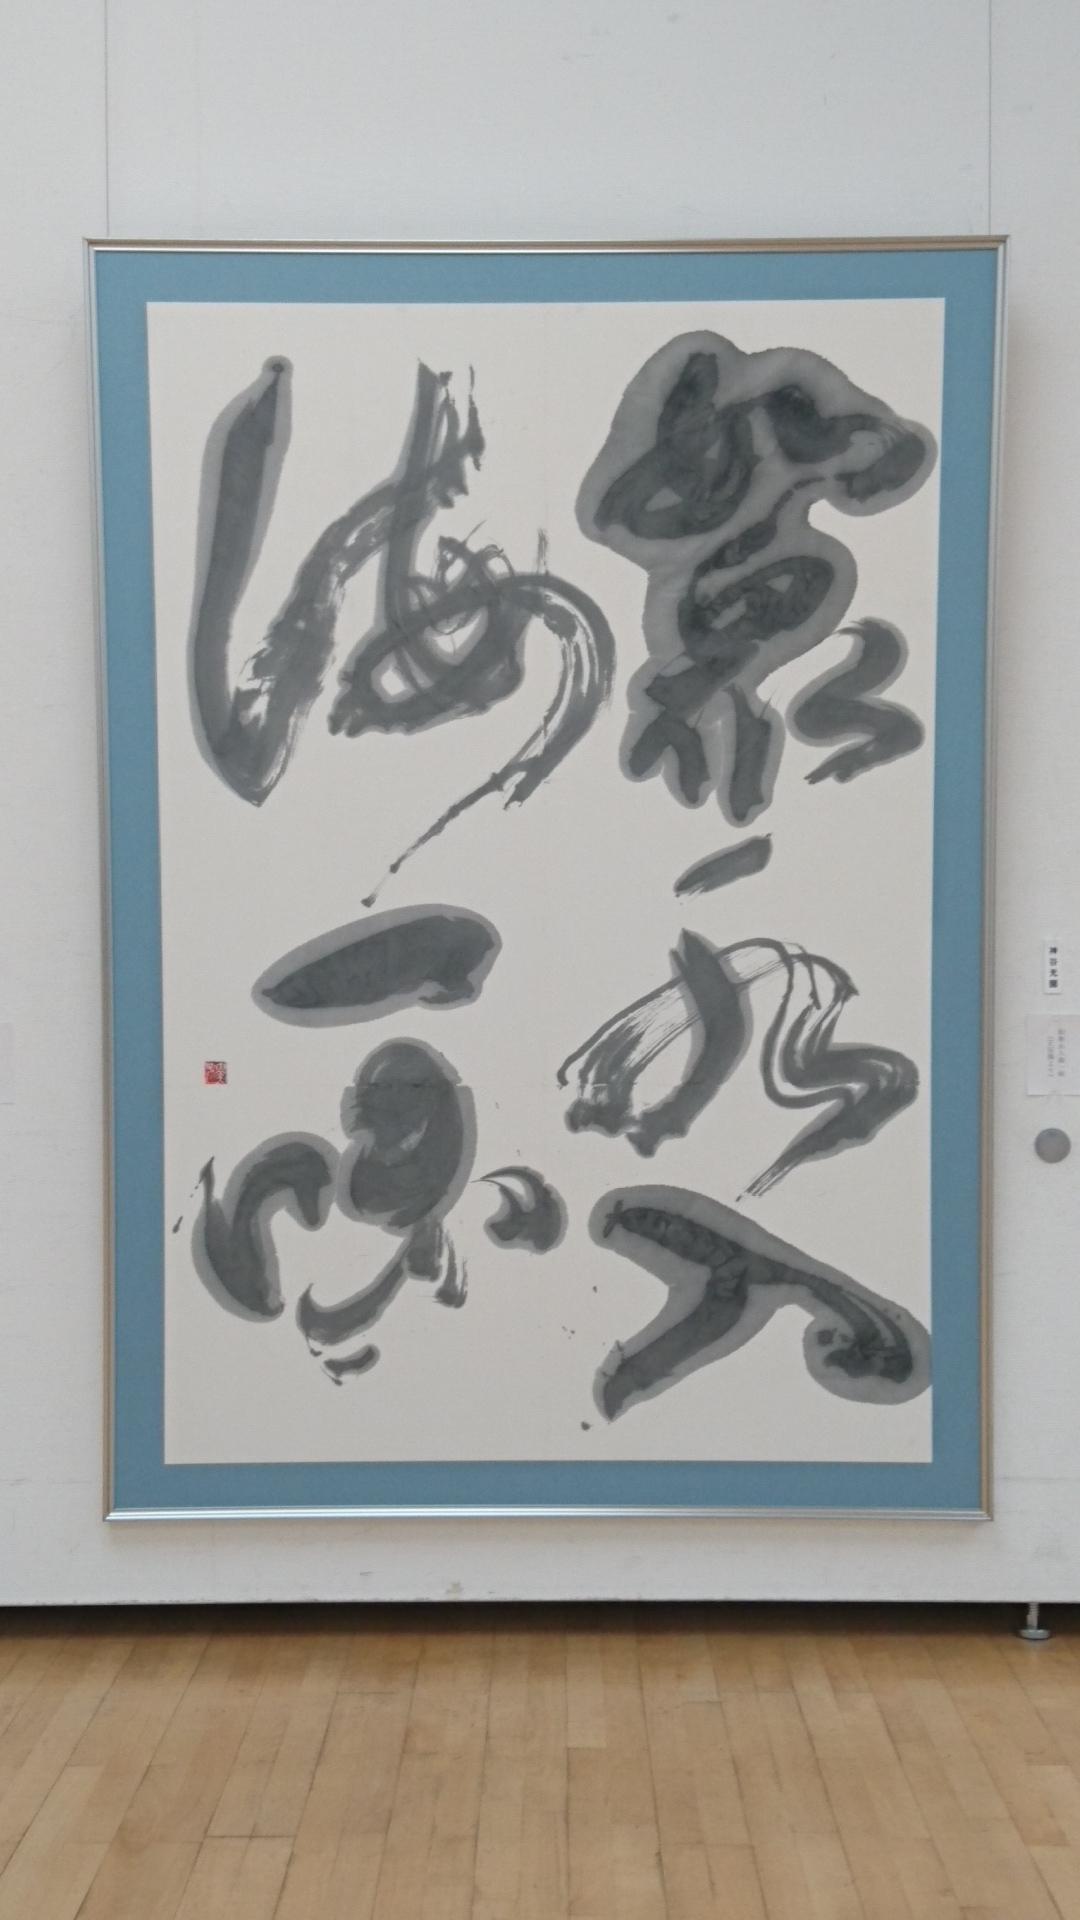 2017.11.18 夕照会書展 - 神谷光園さん「如衆水入海一味」